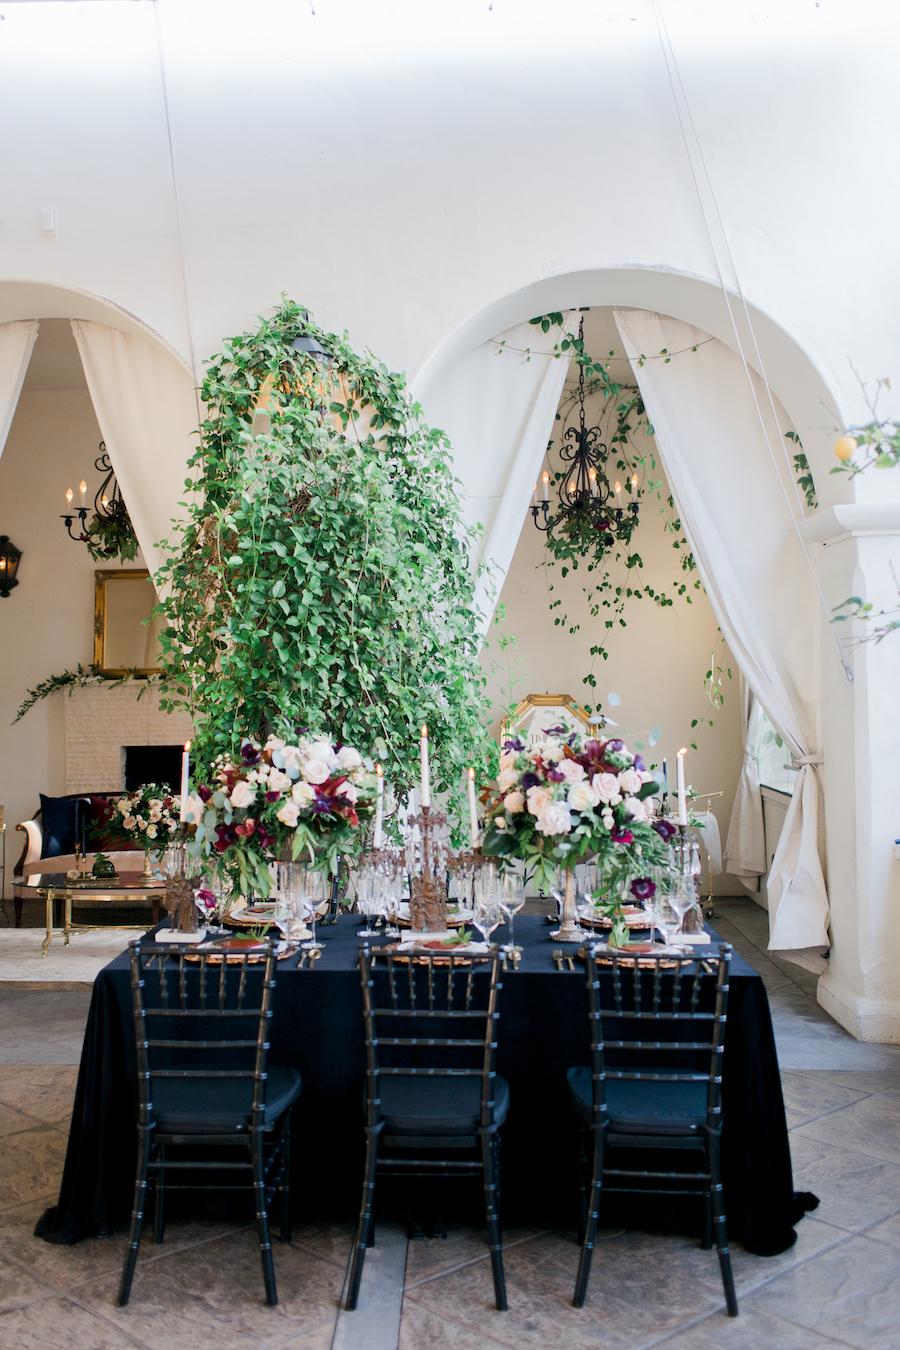 burlap-and-bordeux-steven-leyva-photography-villa-and-vine-wedding-styled-shoot4.jpg